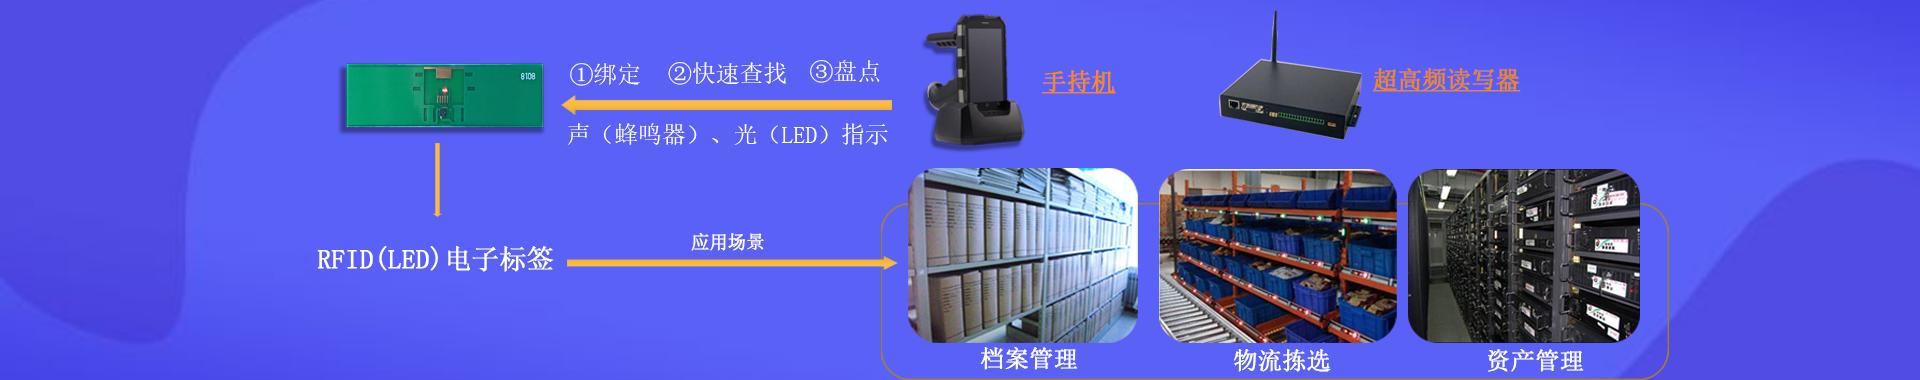 RFID智慧档案,仓储,资产管理解决方案-深圳铨顺宏